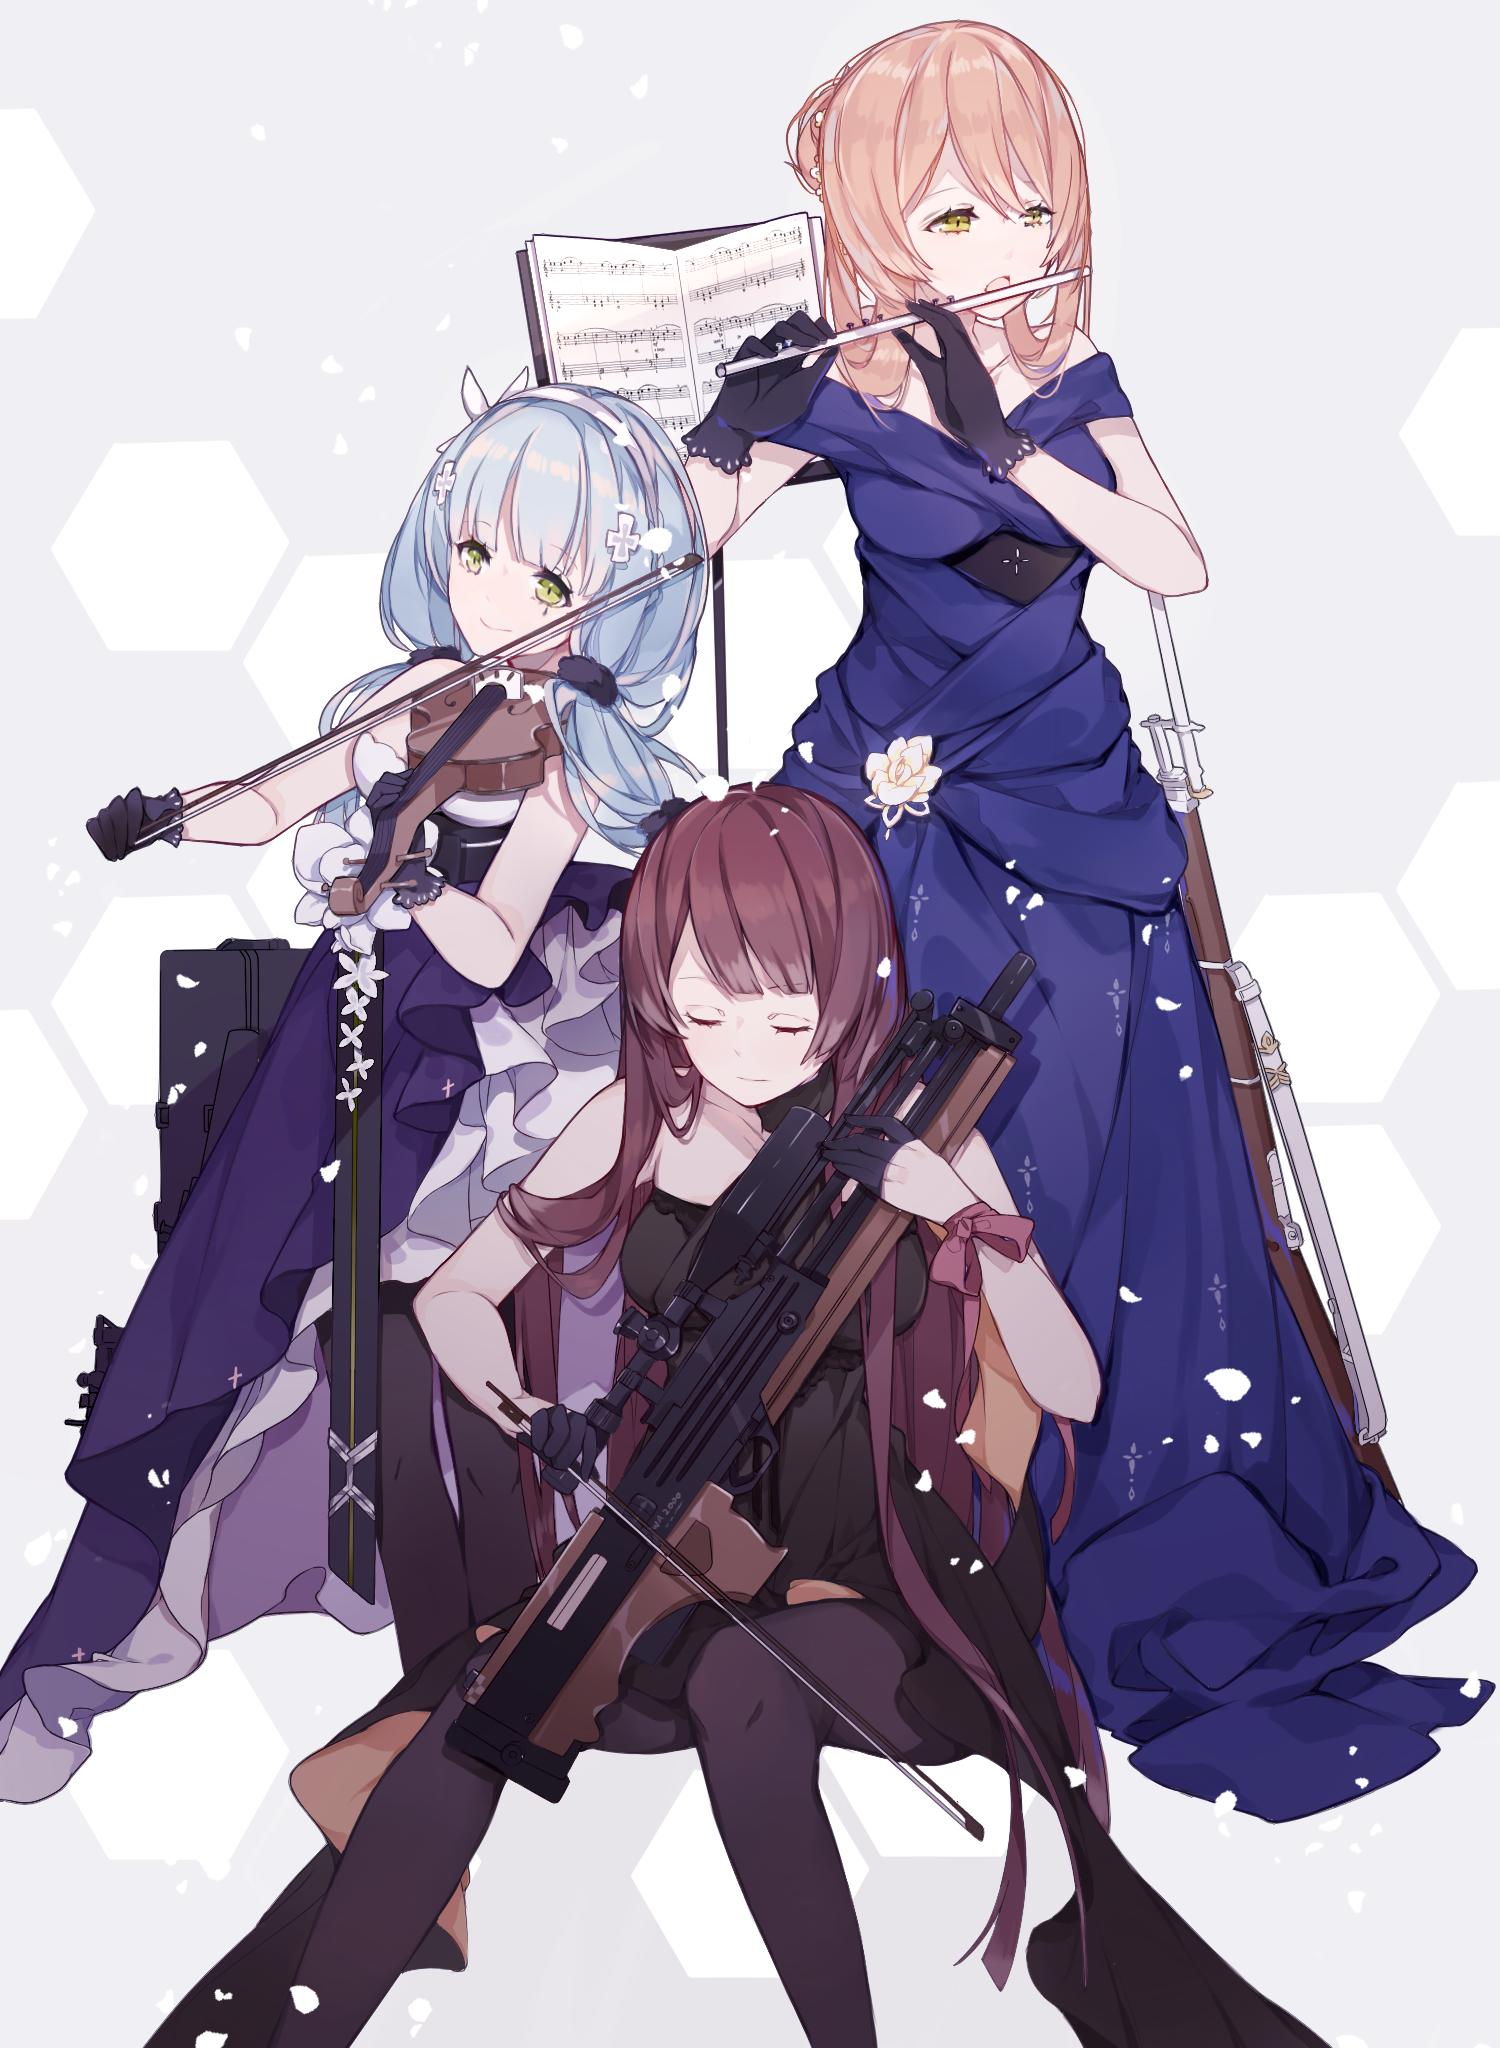 Anime 1500x2048 Mi'yuki anime anime girls portrait display Girls Frontline HK416 (Girls Frontline) Springfield (Girls Frontline) WA2000 (Girls Frontline) violin